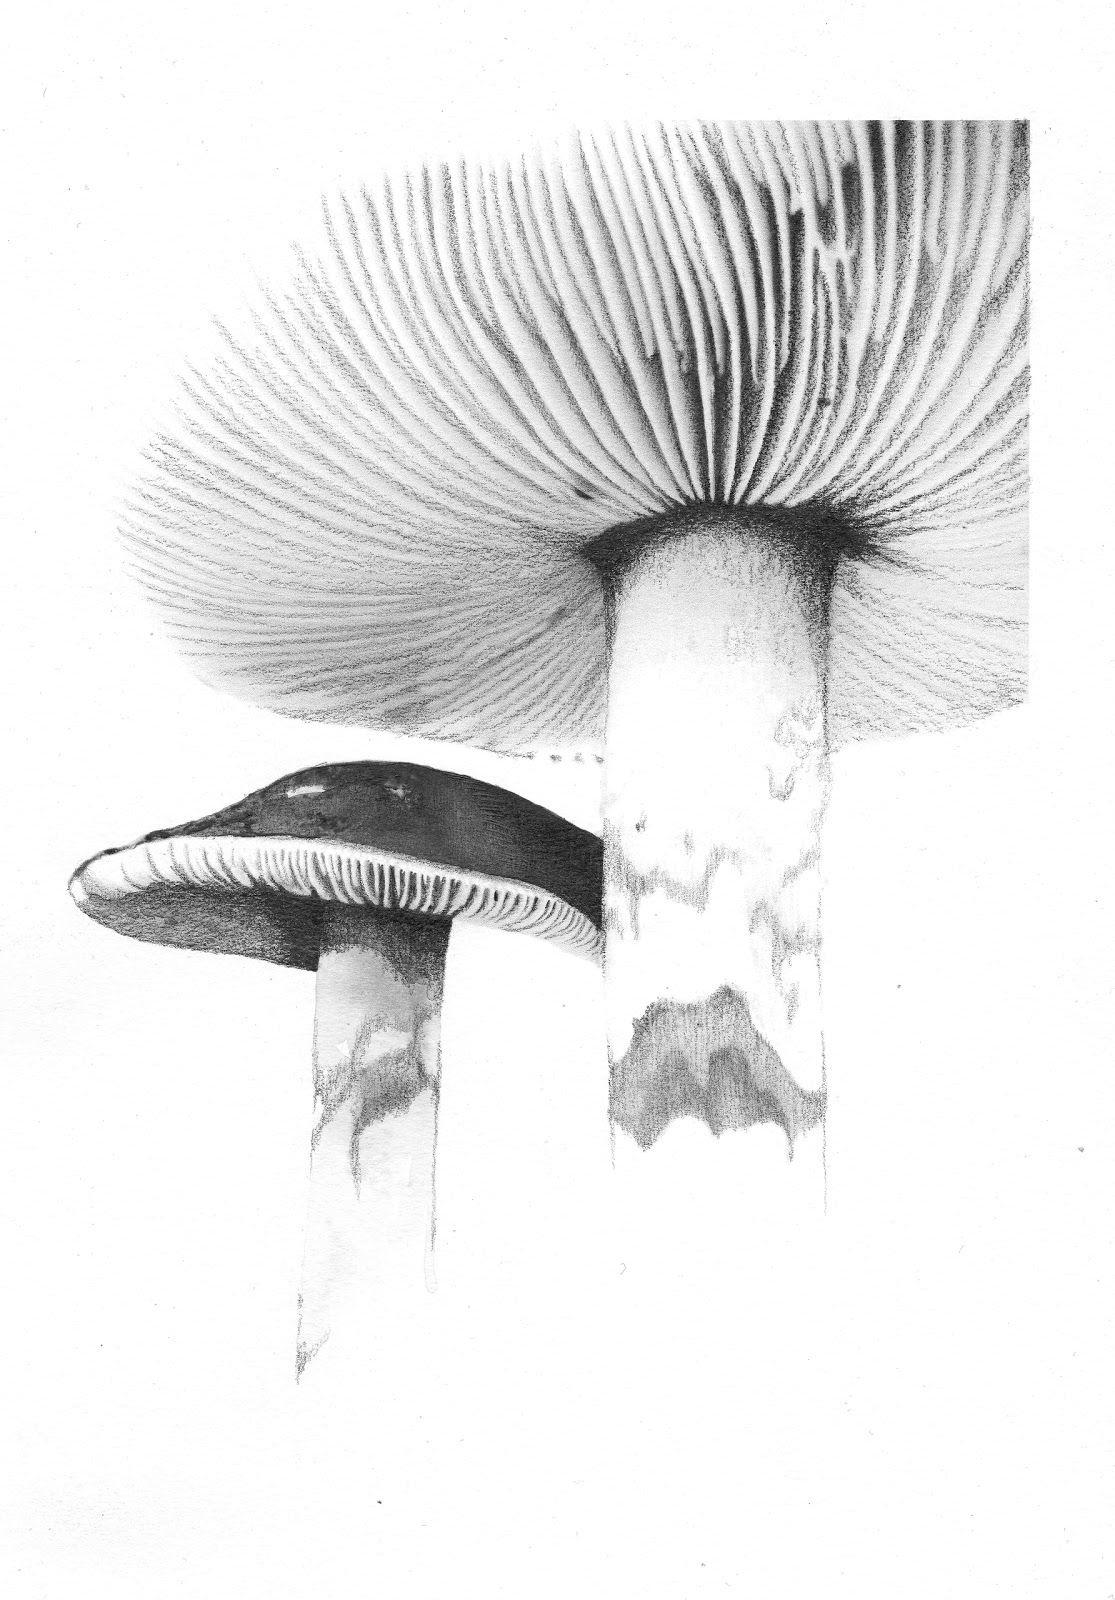 Stacey Rees Mushroom 1